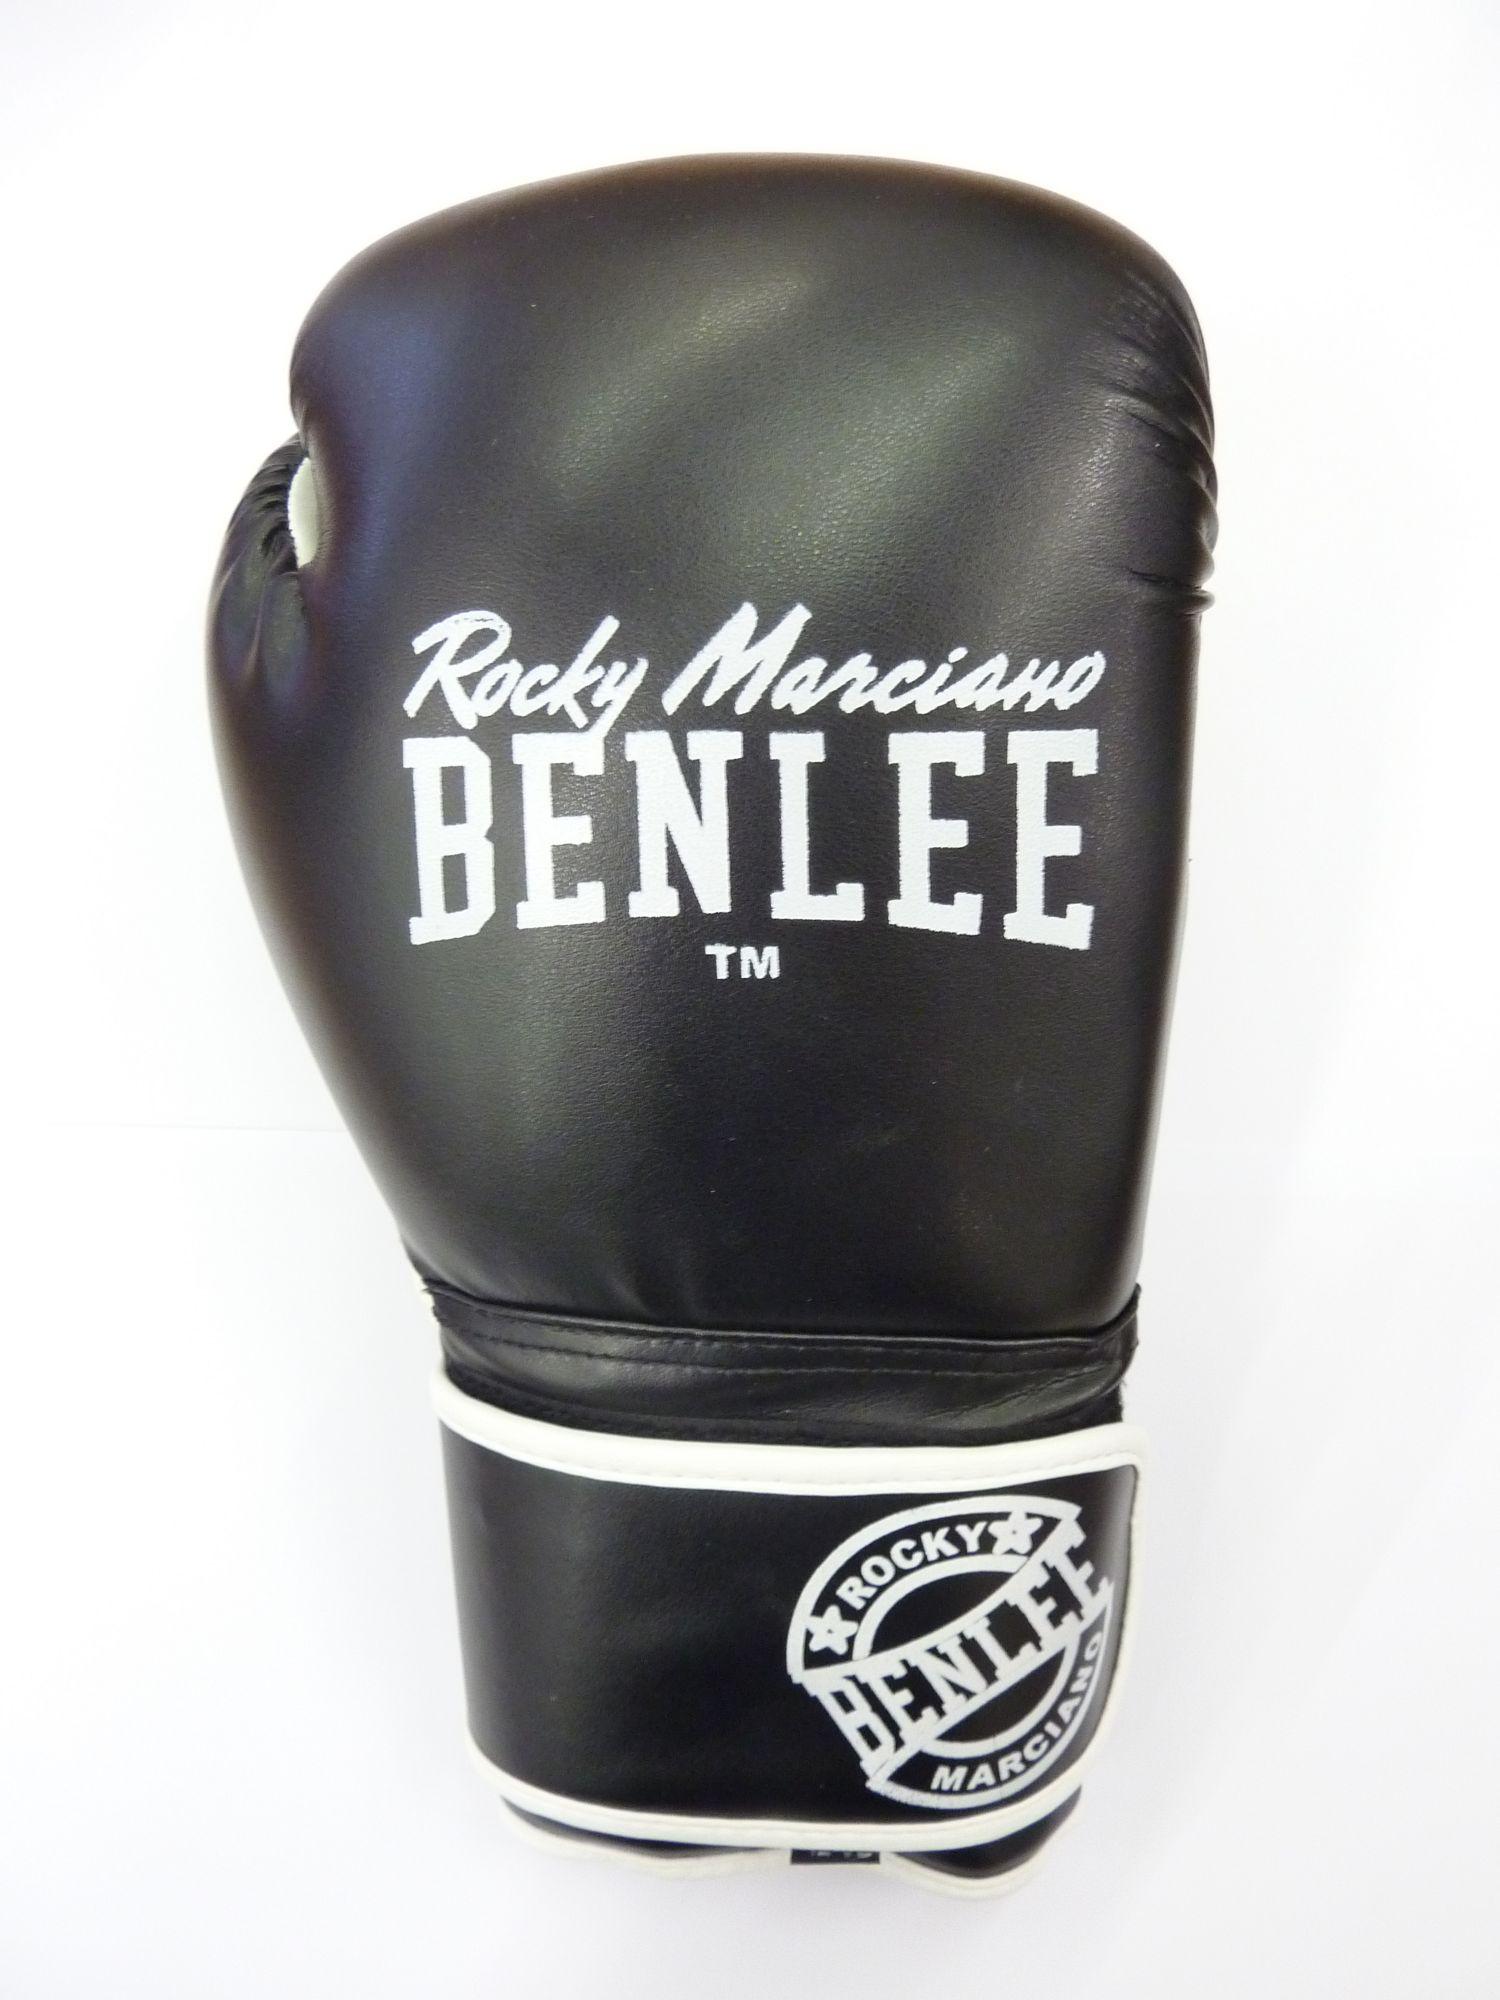 BENLEE ROCKY MARCIANO Benlee Rocky Marciano Handschuh